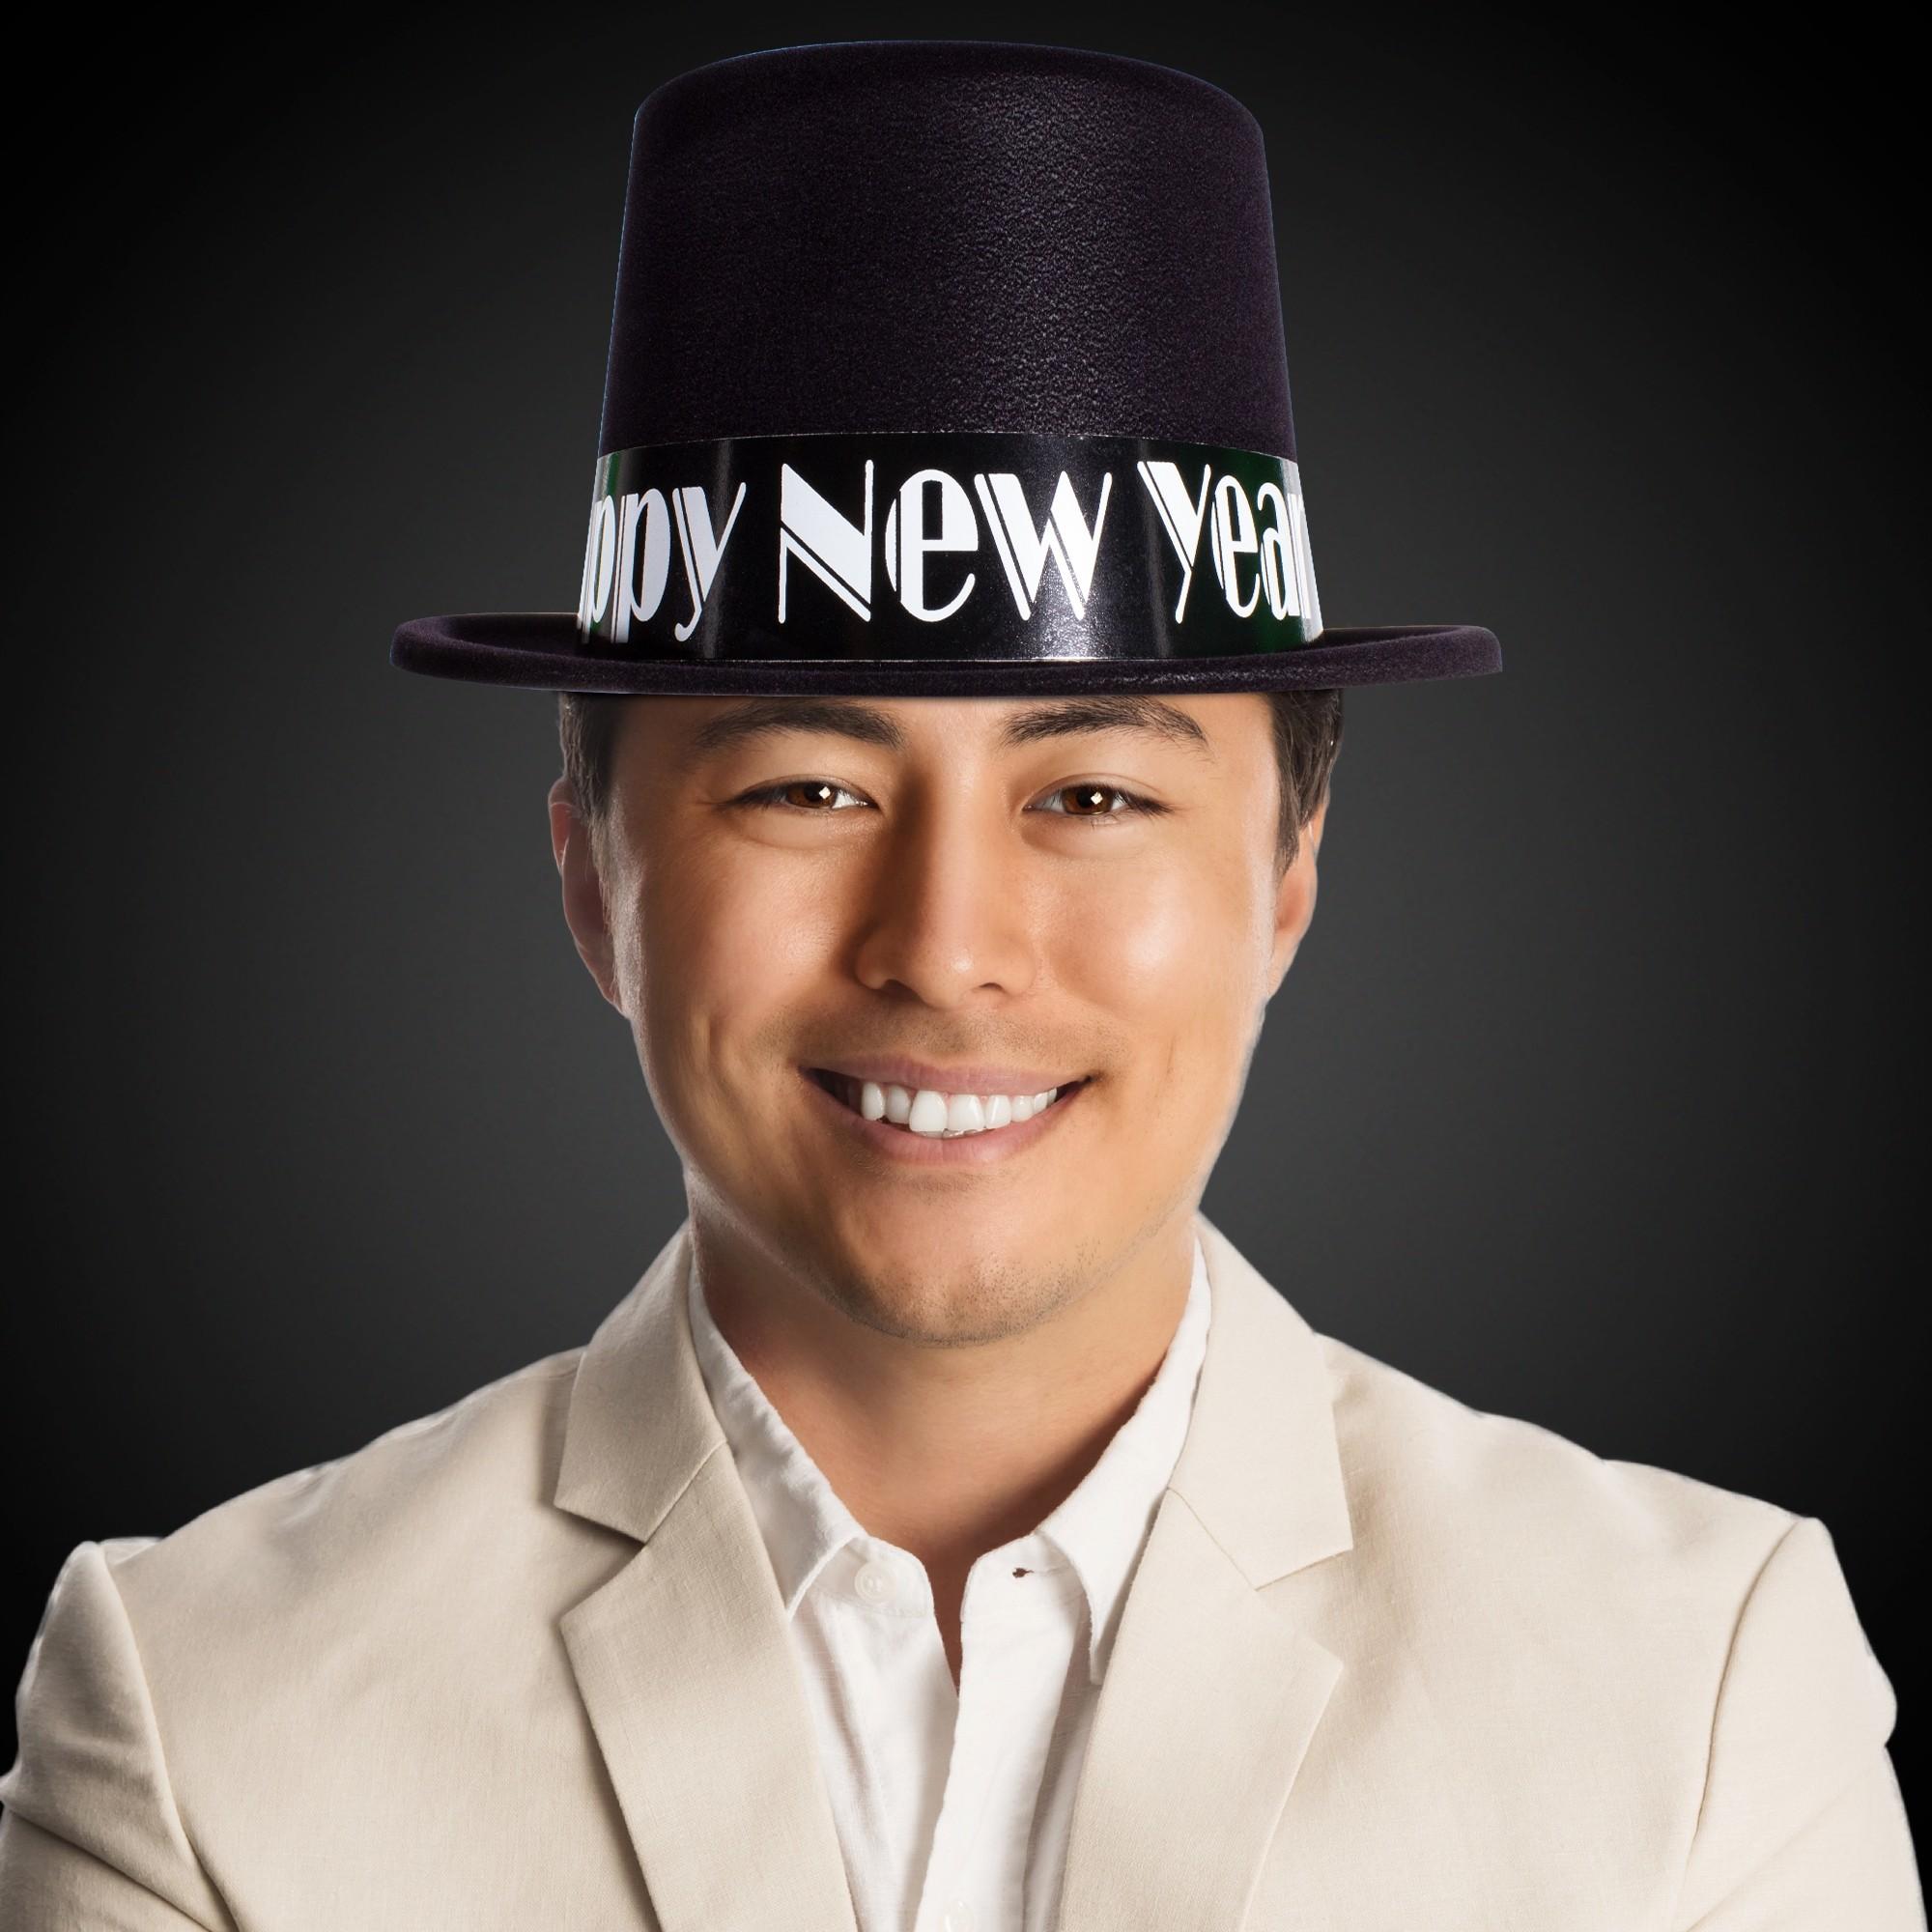 Black Happy New Year Top Hat